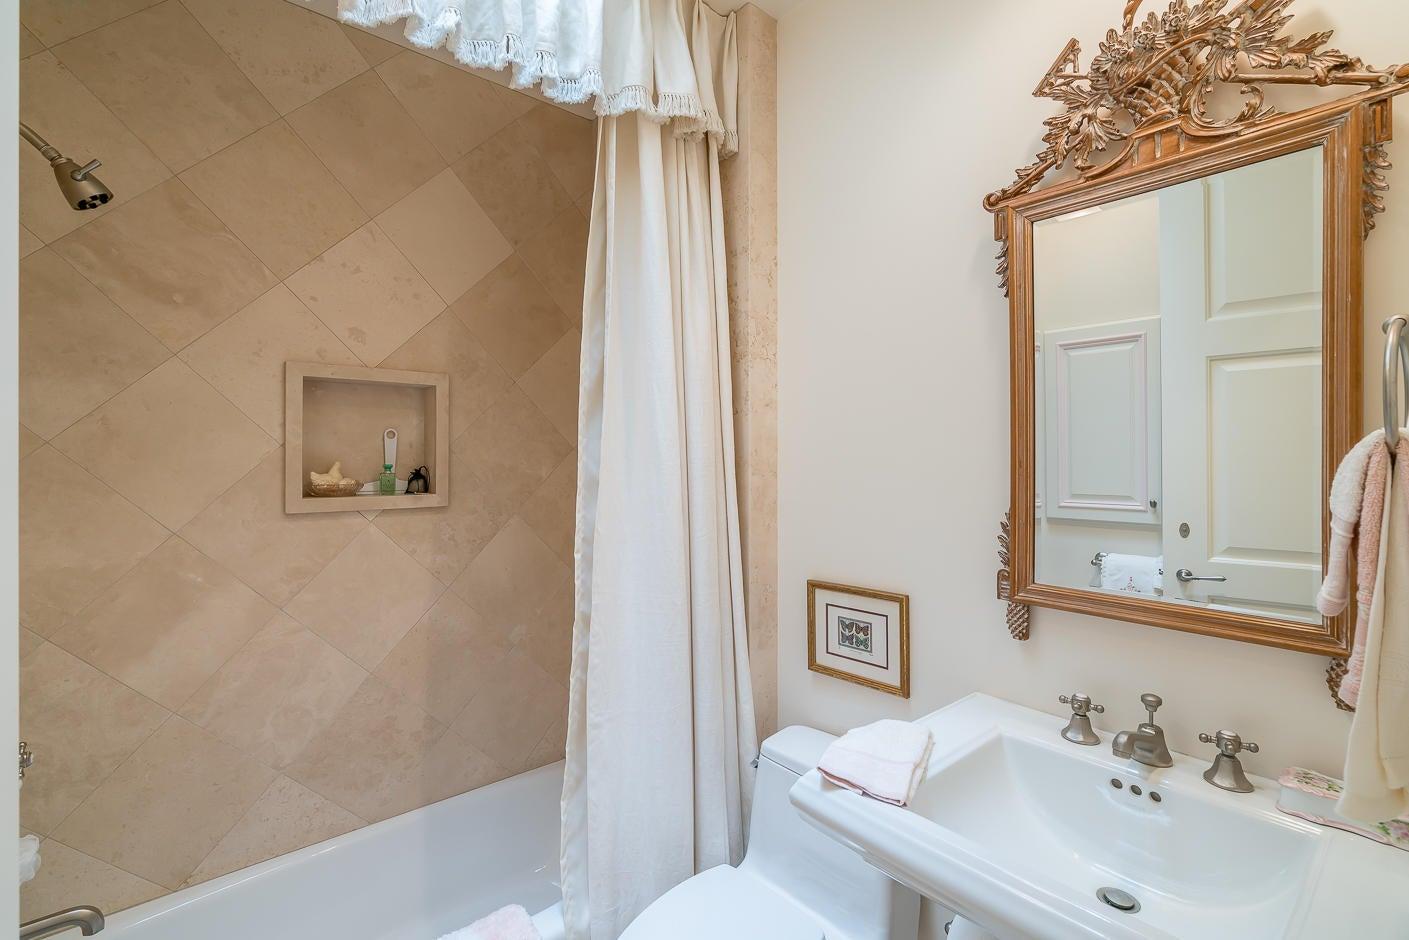 30 San Leandro bathroom 1